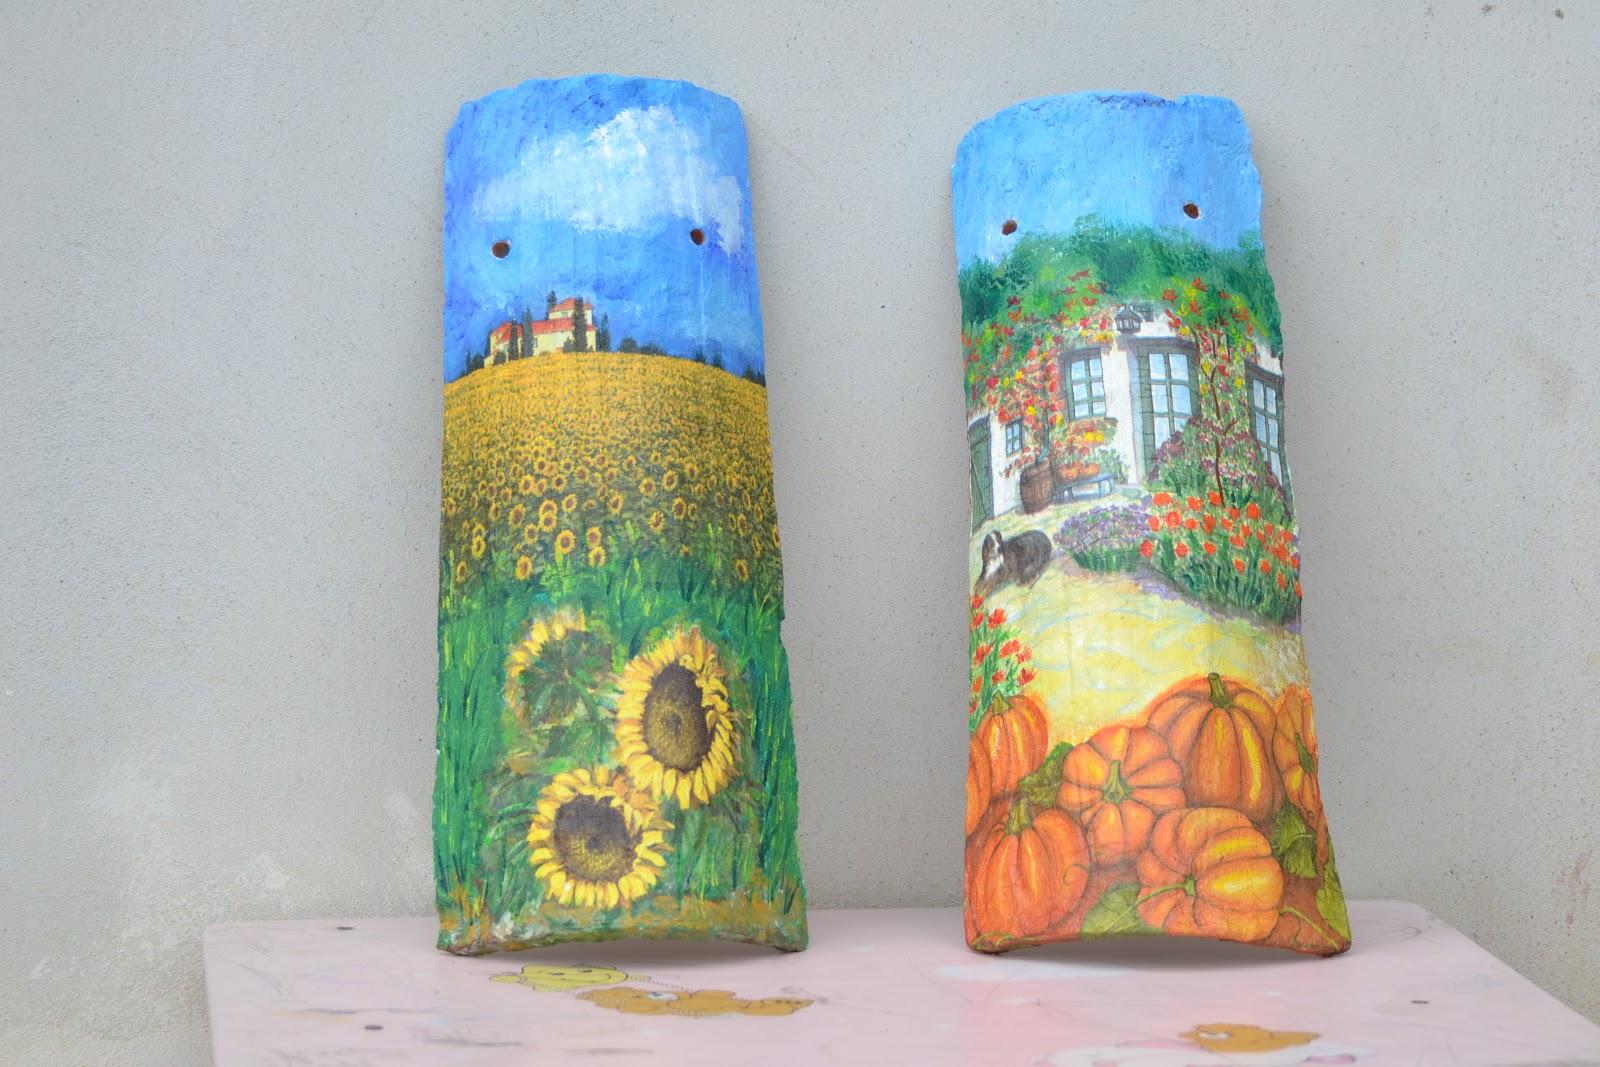 Cipeciopcreattivi tegole decorate - Tegole decorate ...